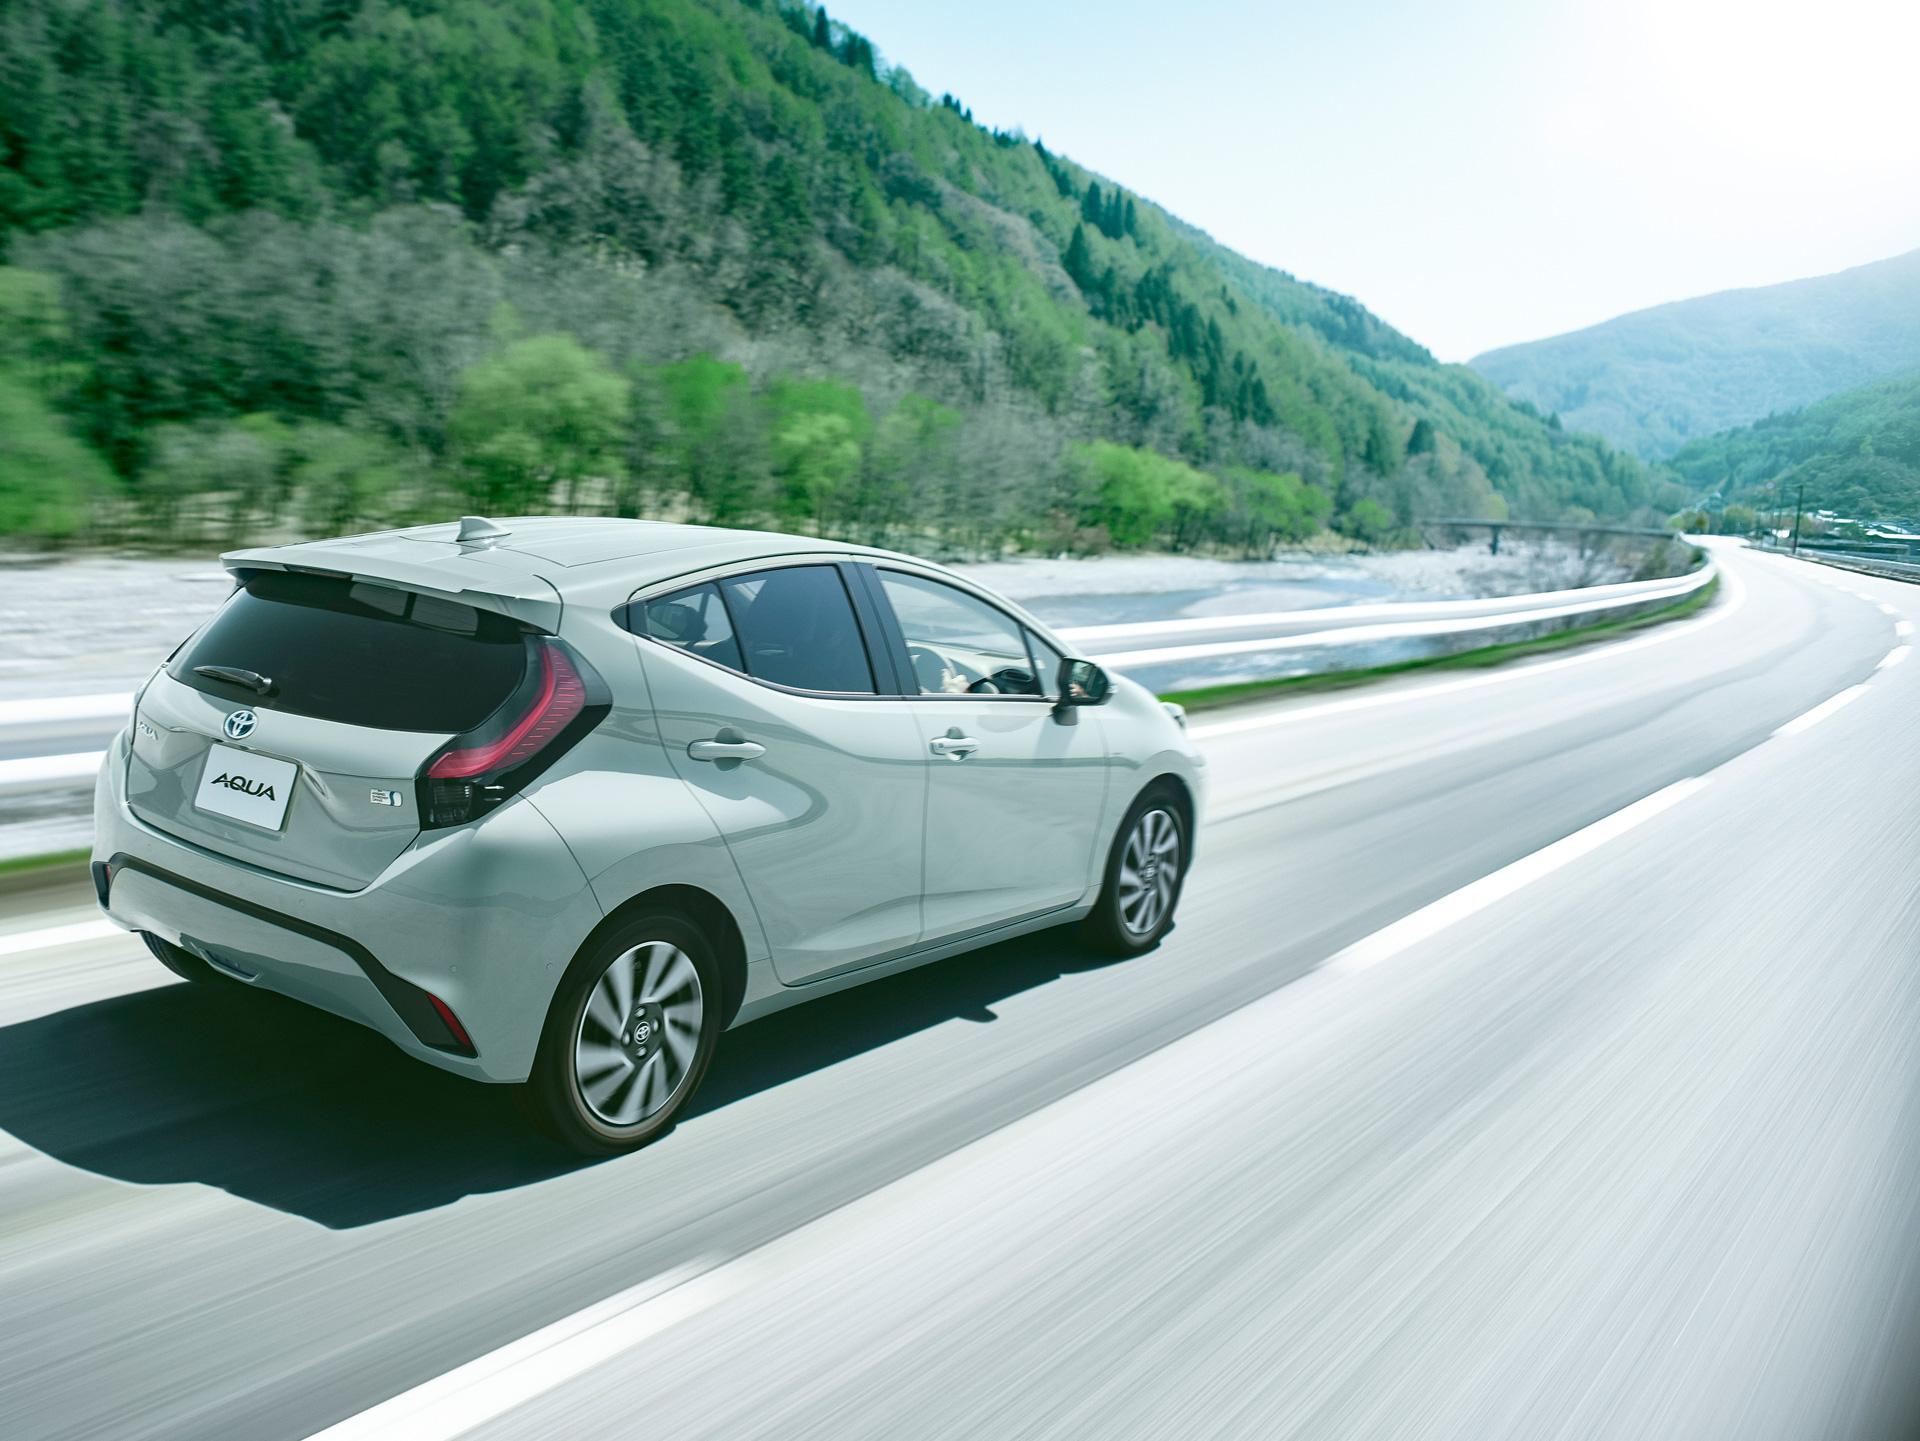 Toyota to Launch All-New Aqua - Image 5